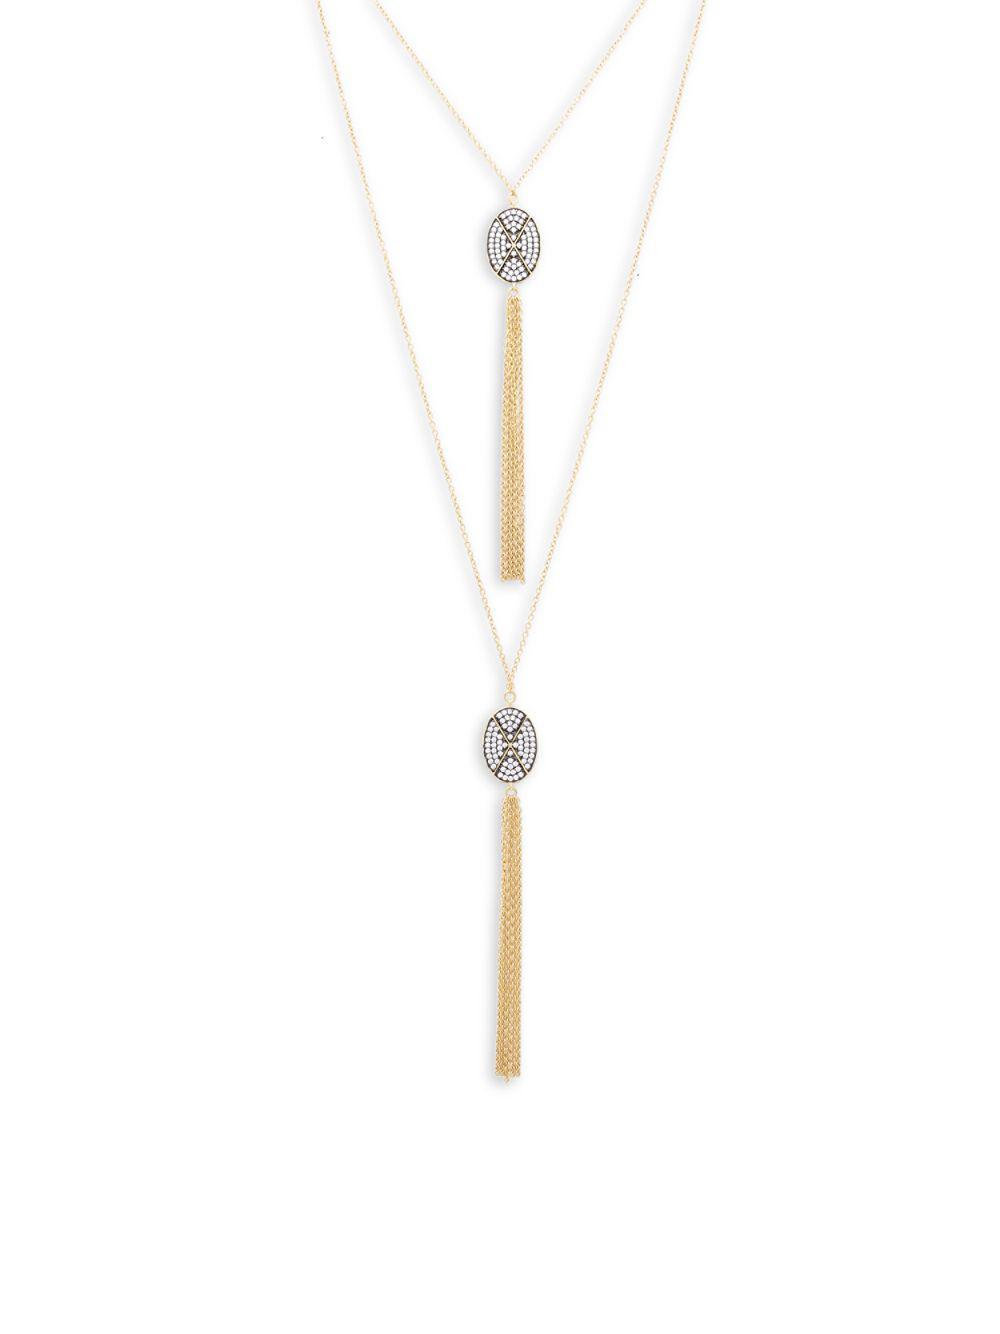 Lyst - Freida rothman Contemporary Deco Tassel Necklace in Metallic